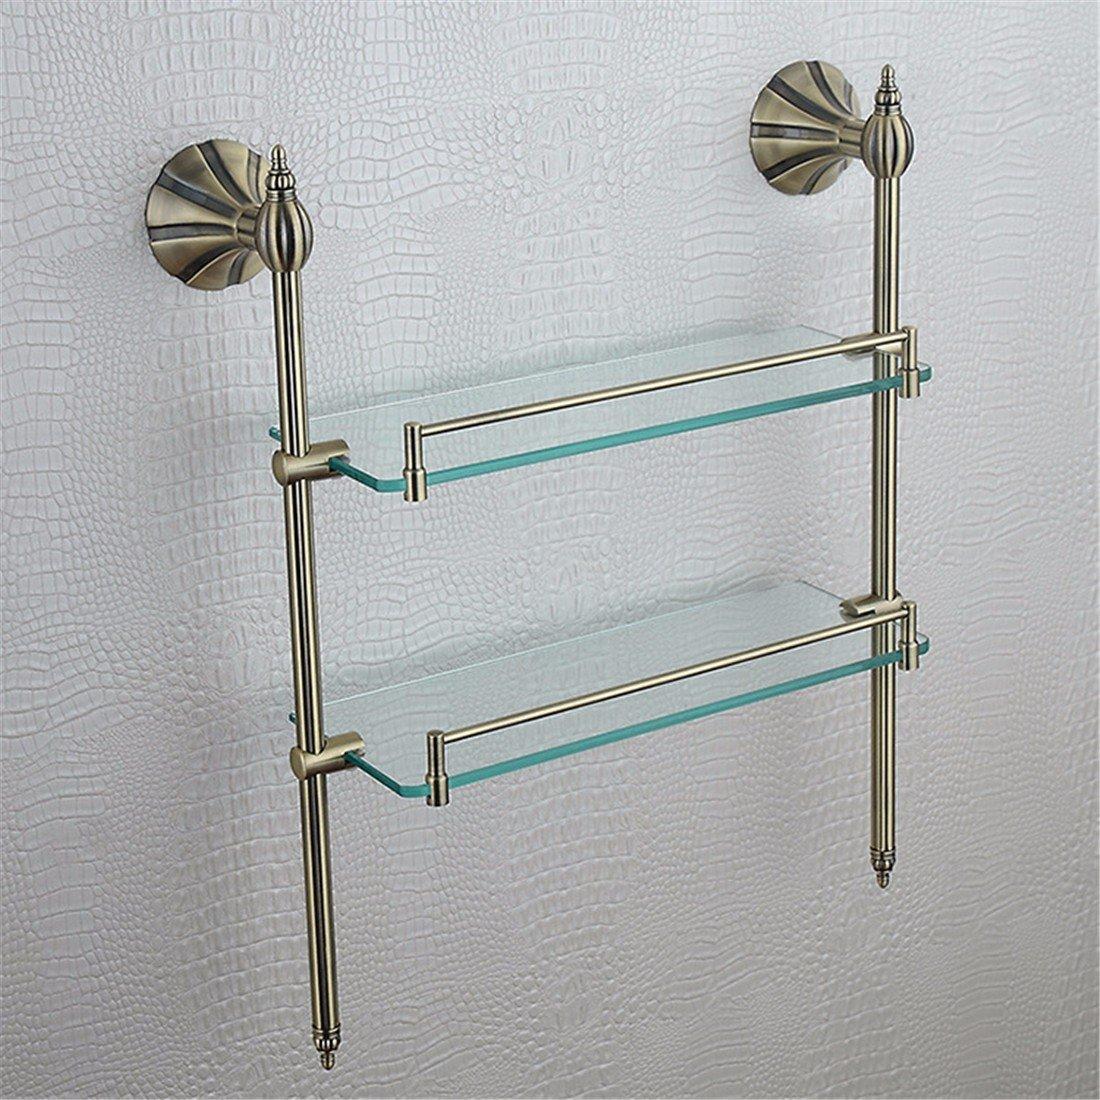 LAONA European style full copper imitation antique bronze petal base, bathroom fittings, toilet brush rack, towel rack, toilet paper rack,Rack 2